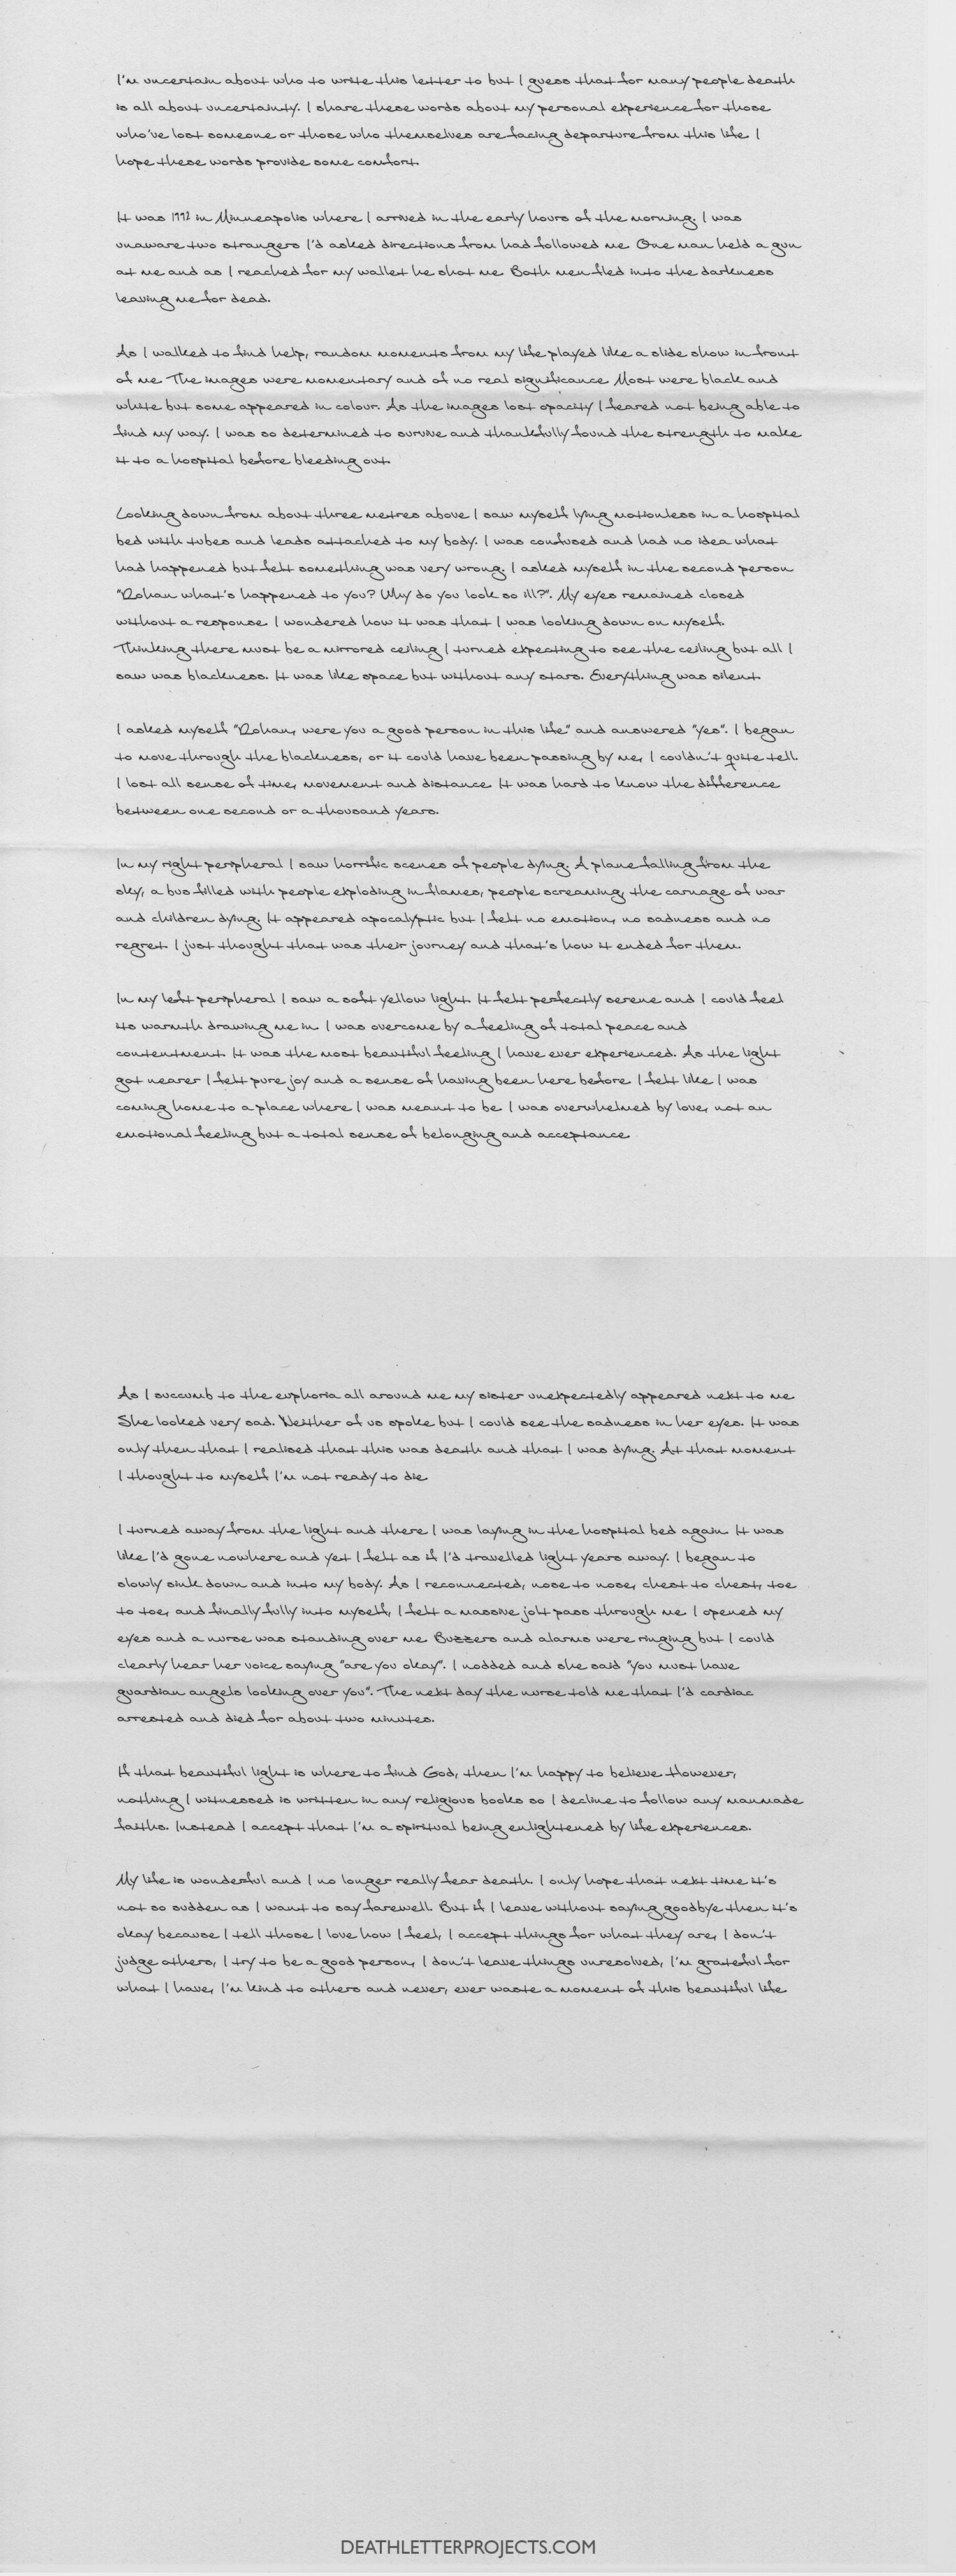 Rohan-Thomas_Letter-DEATHLETTERPROJECTS.COM